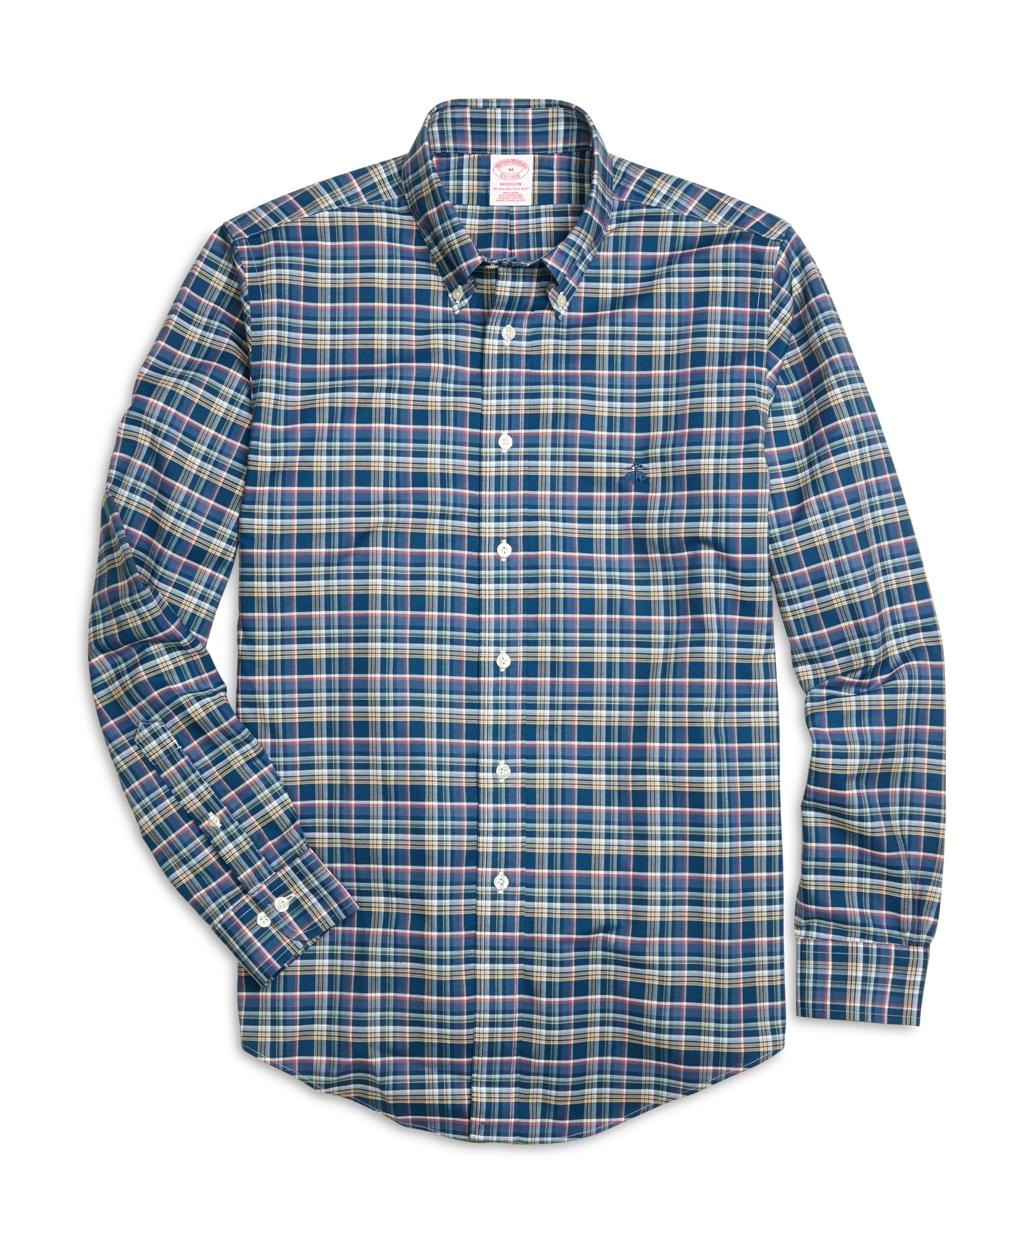 Brooks brothers non iron milano fit multiplaid sport shirt for Brooks brothers sports shirts